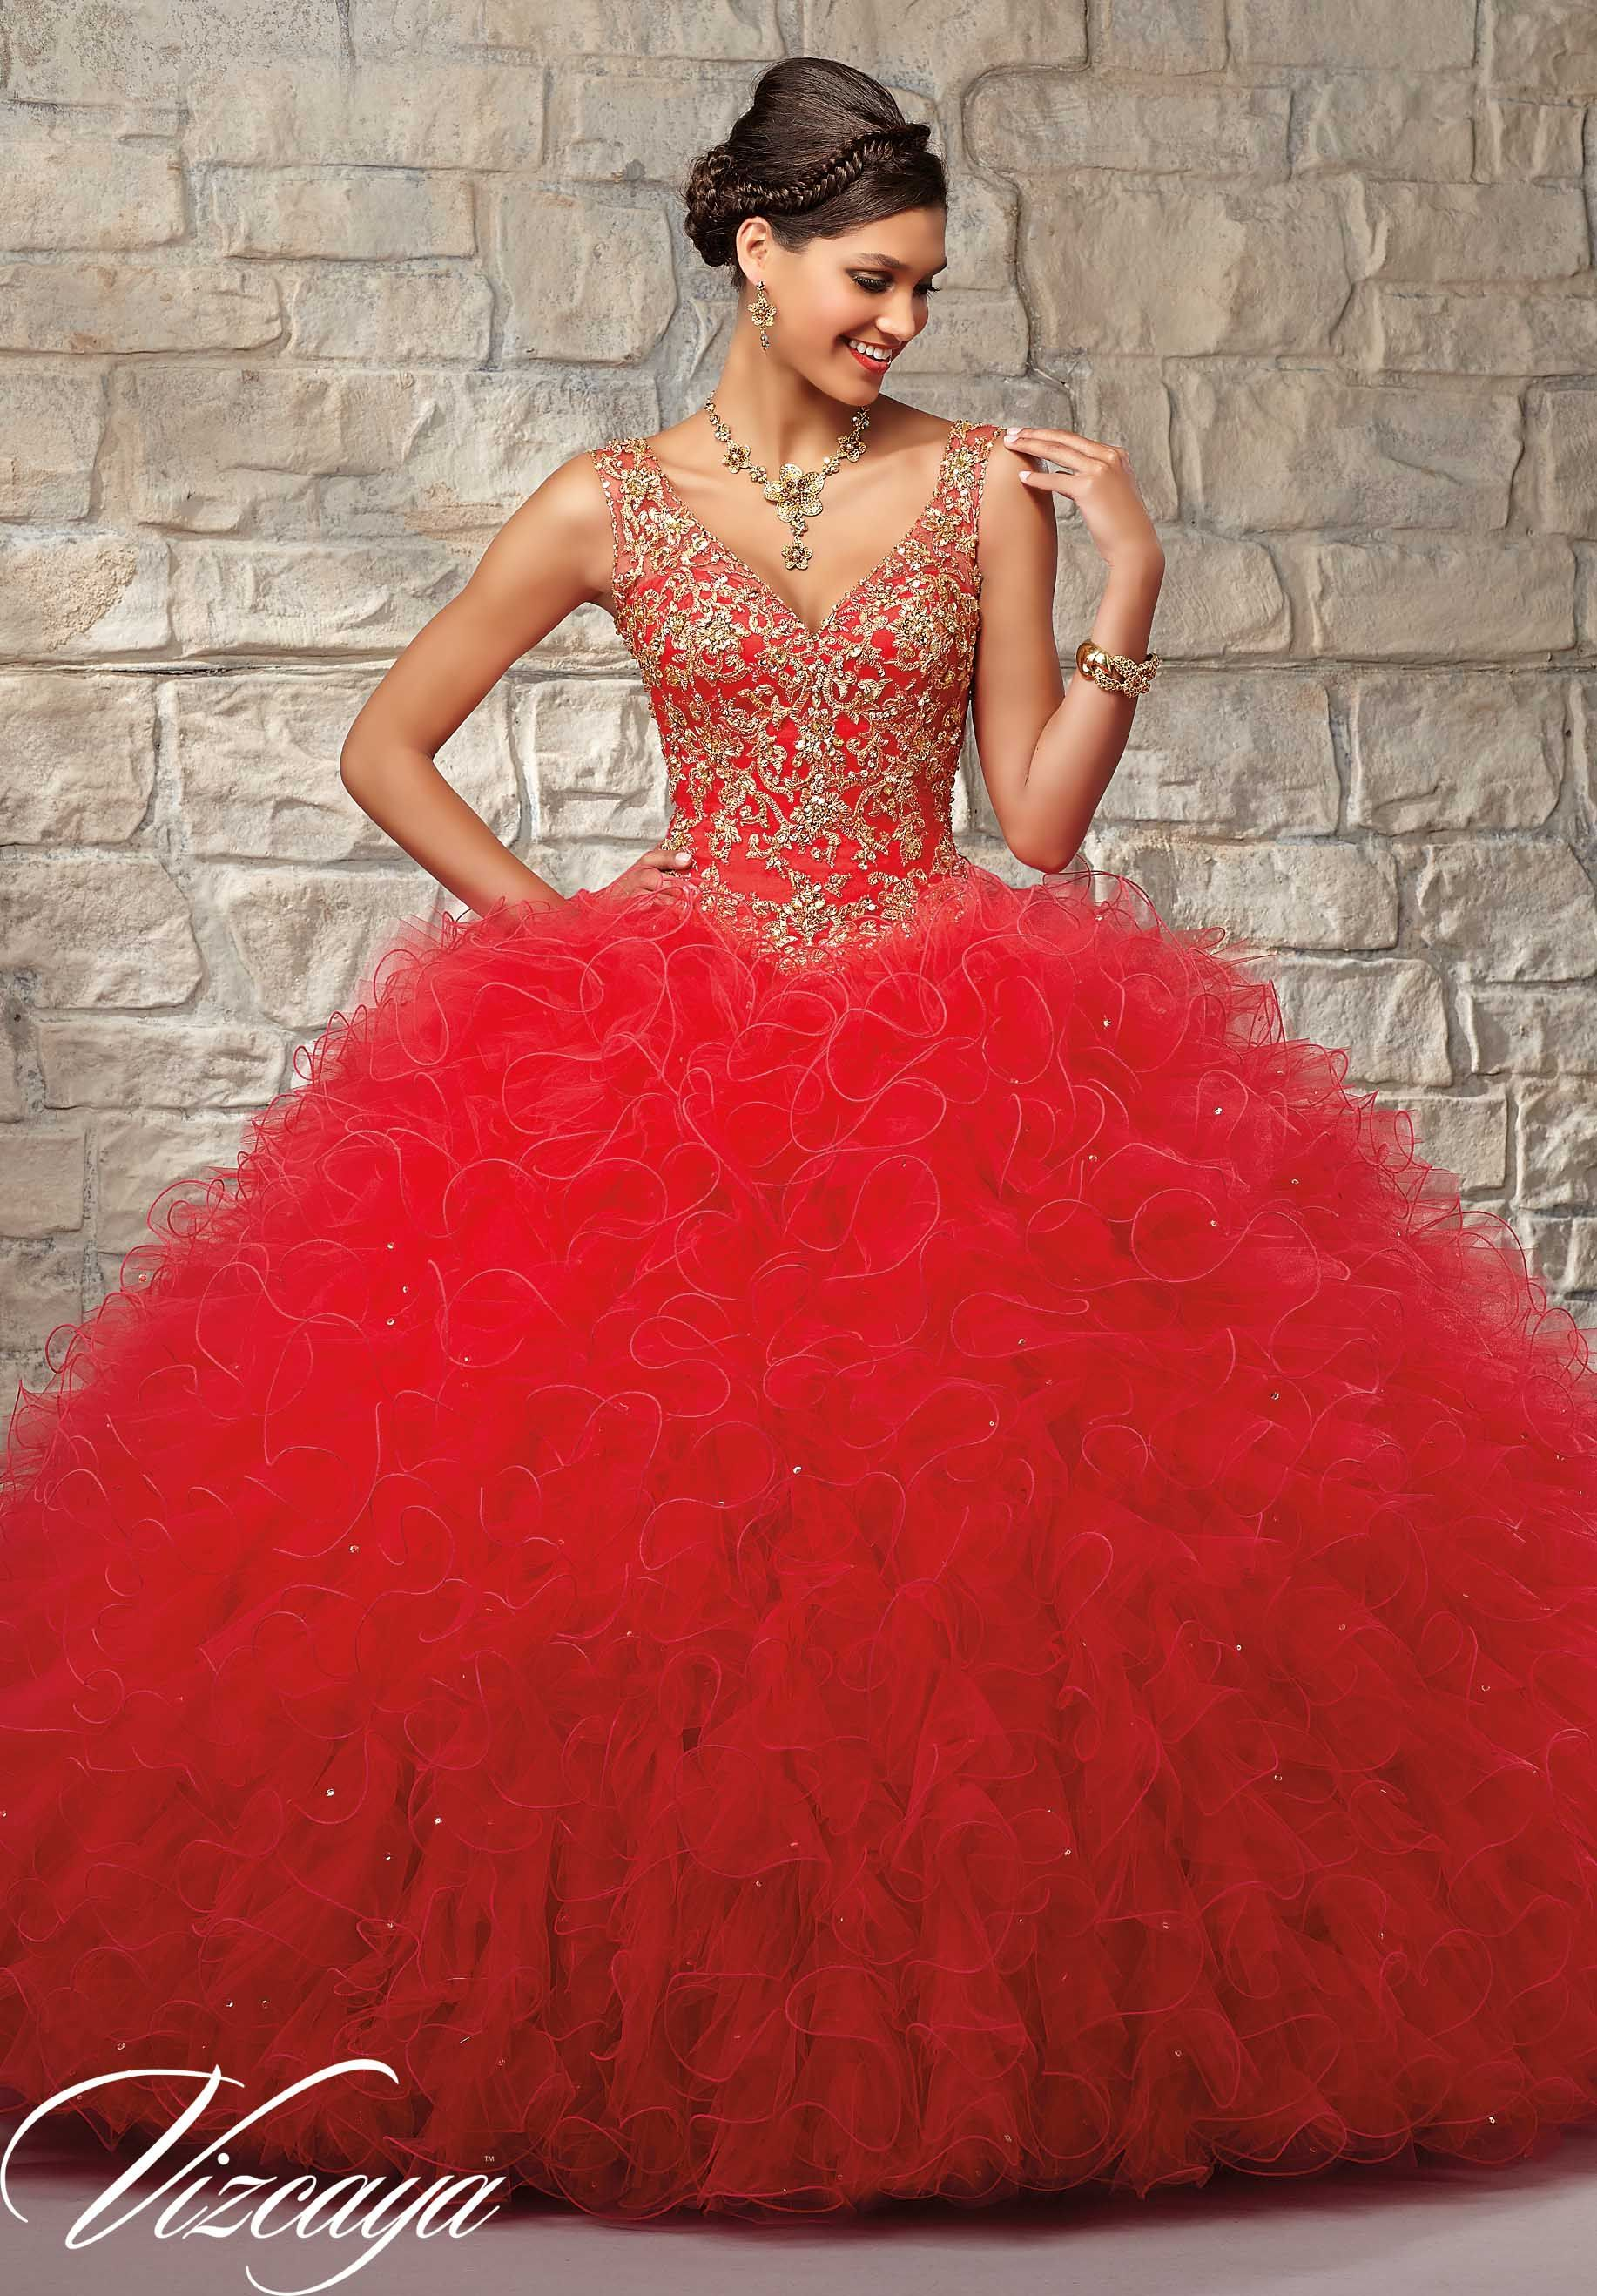 Quinceanera Dresses Vizcaya Gown Dress Style 89037 Quinceanera Dresses Quincenera Dresses Ball Dresses [ 2636 x 1834 Pixel ]